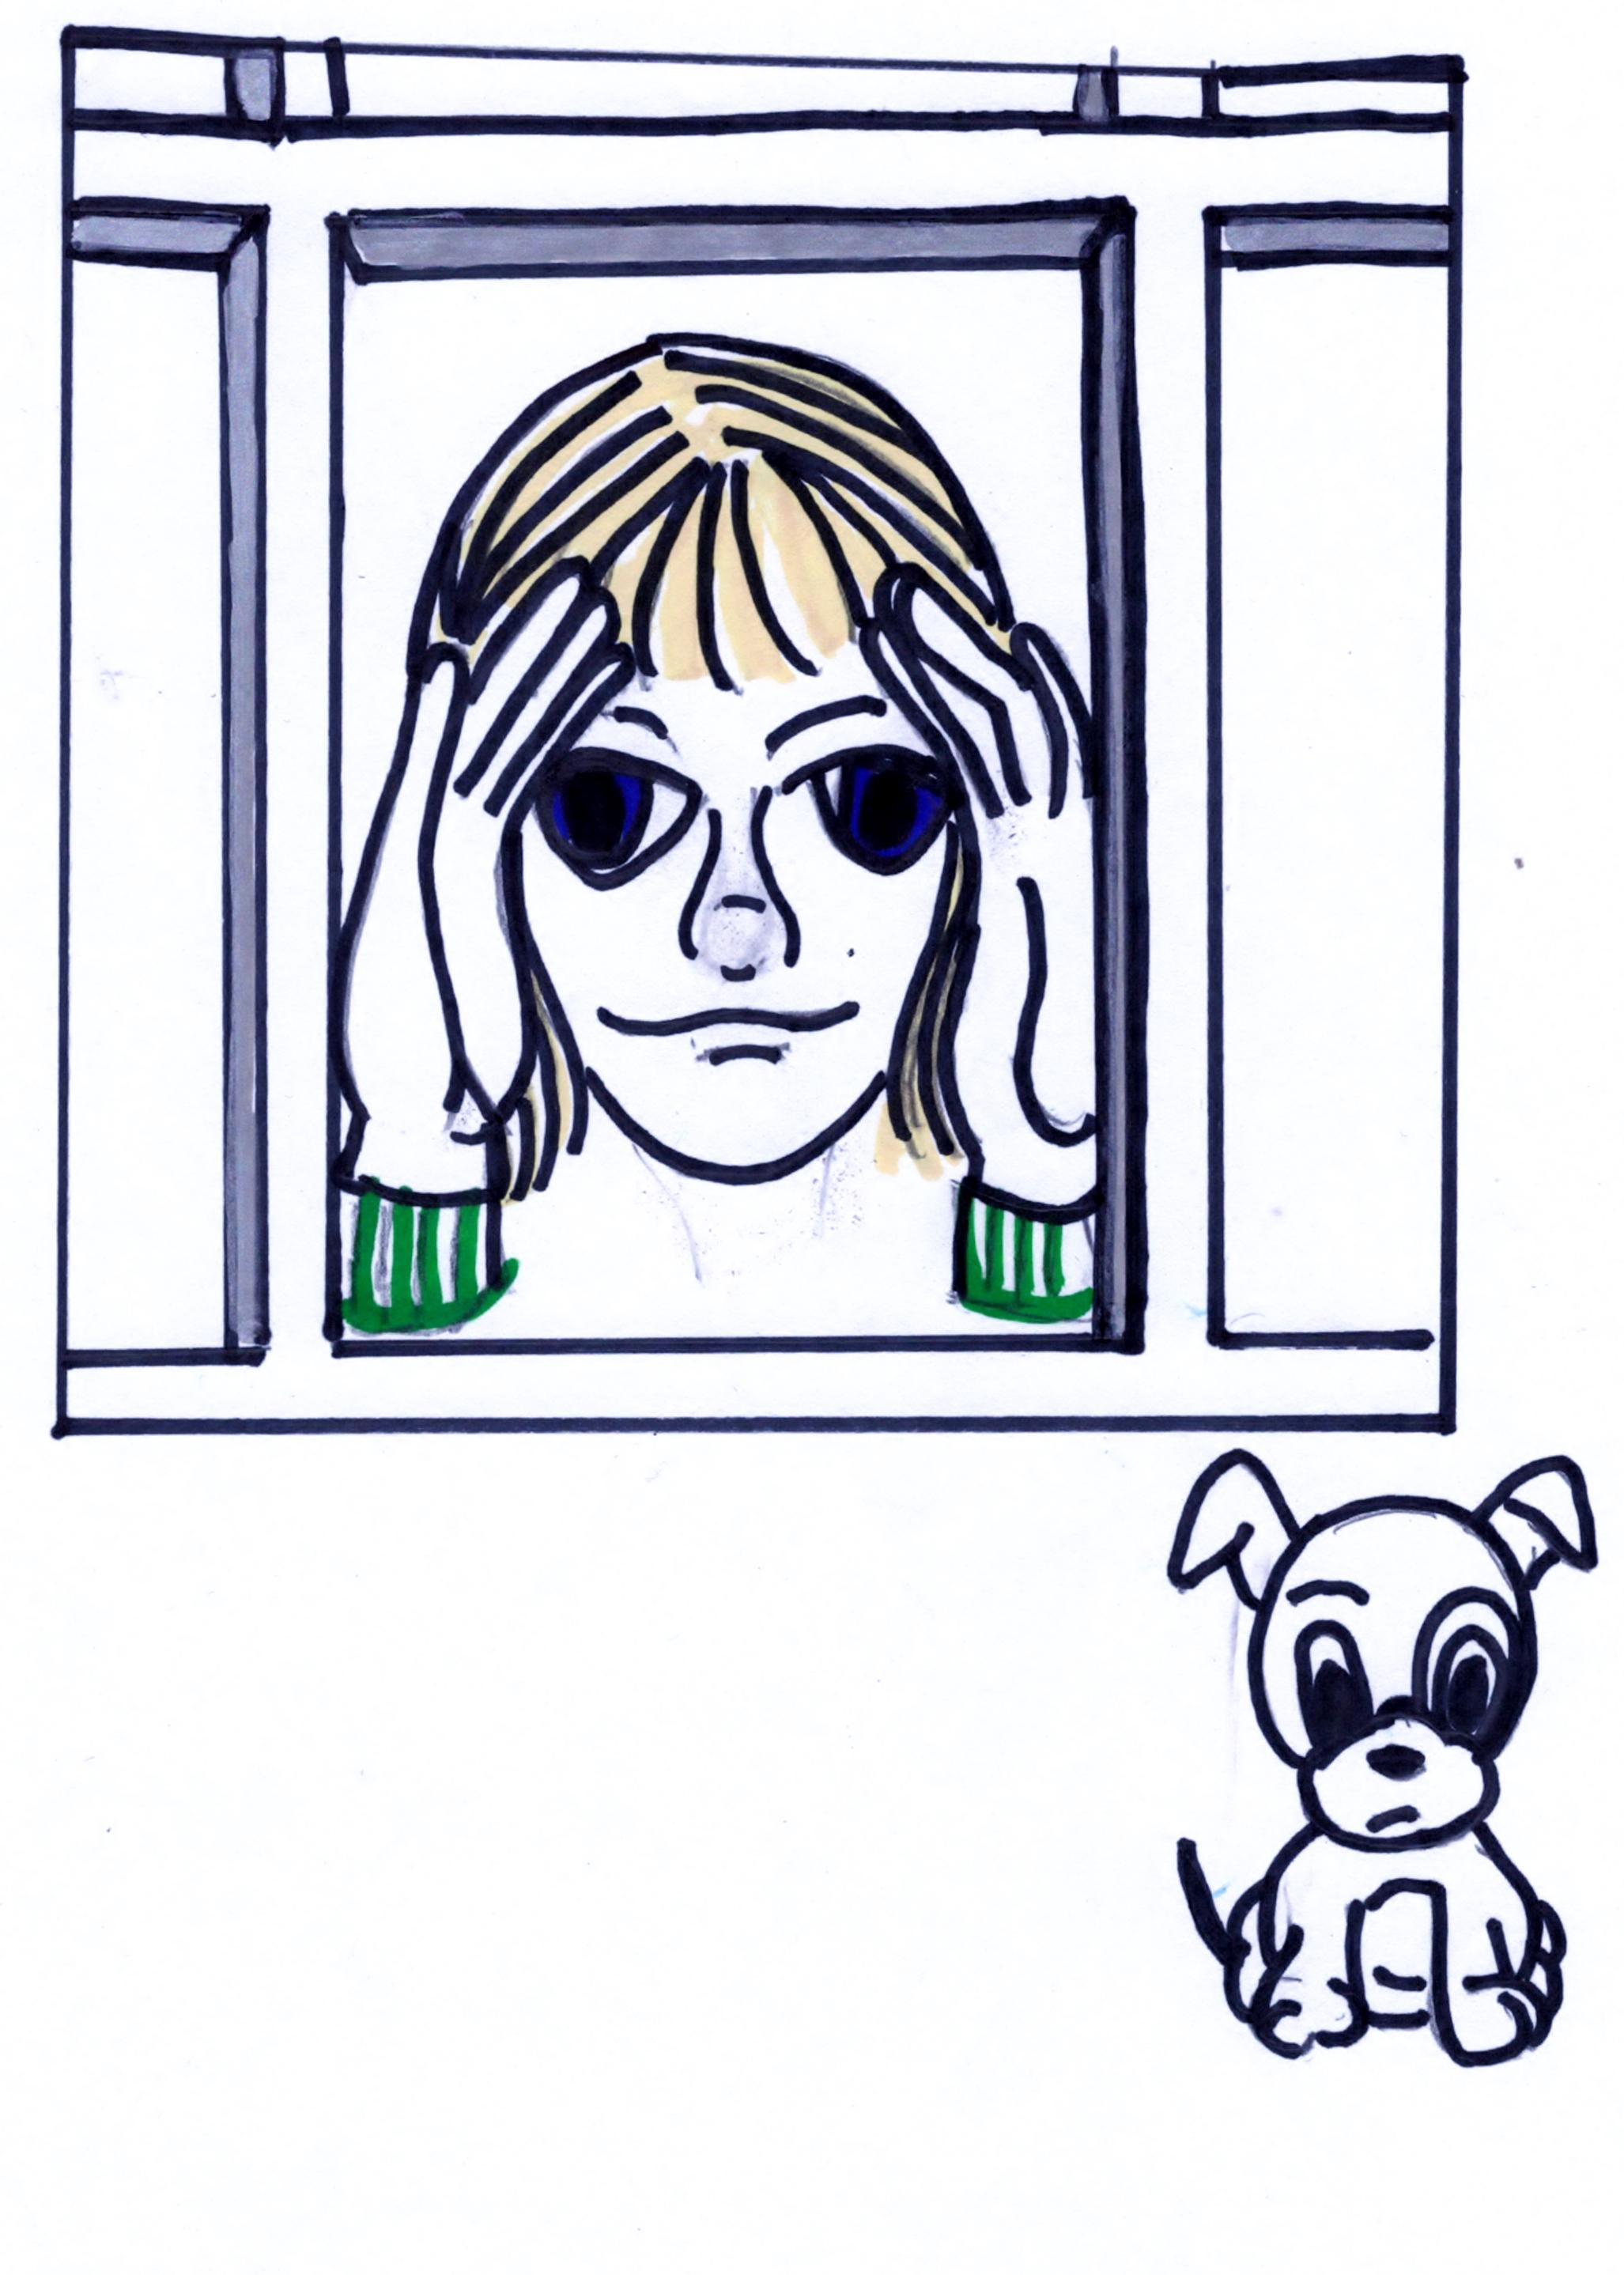 WINDOW PEEPER DOG LICENSE